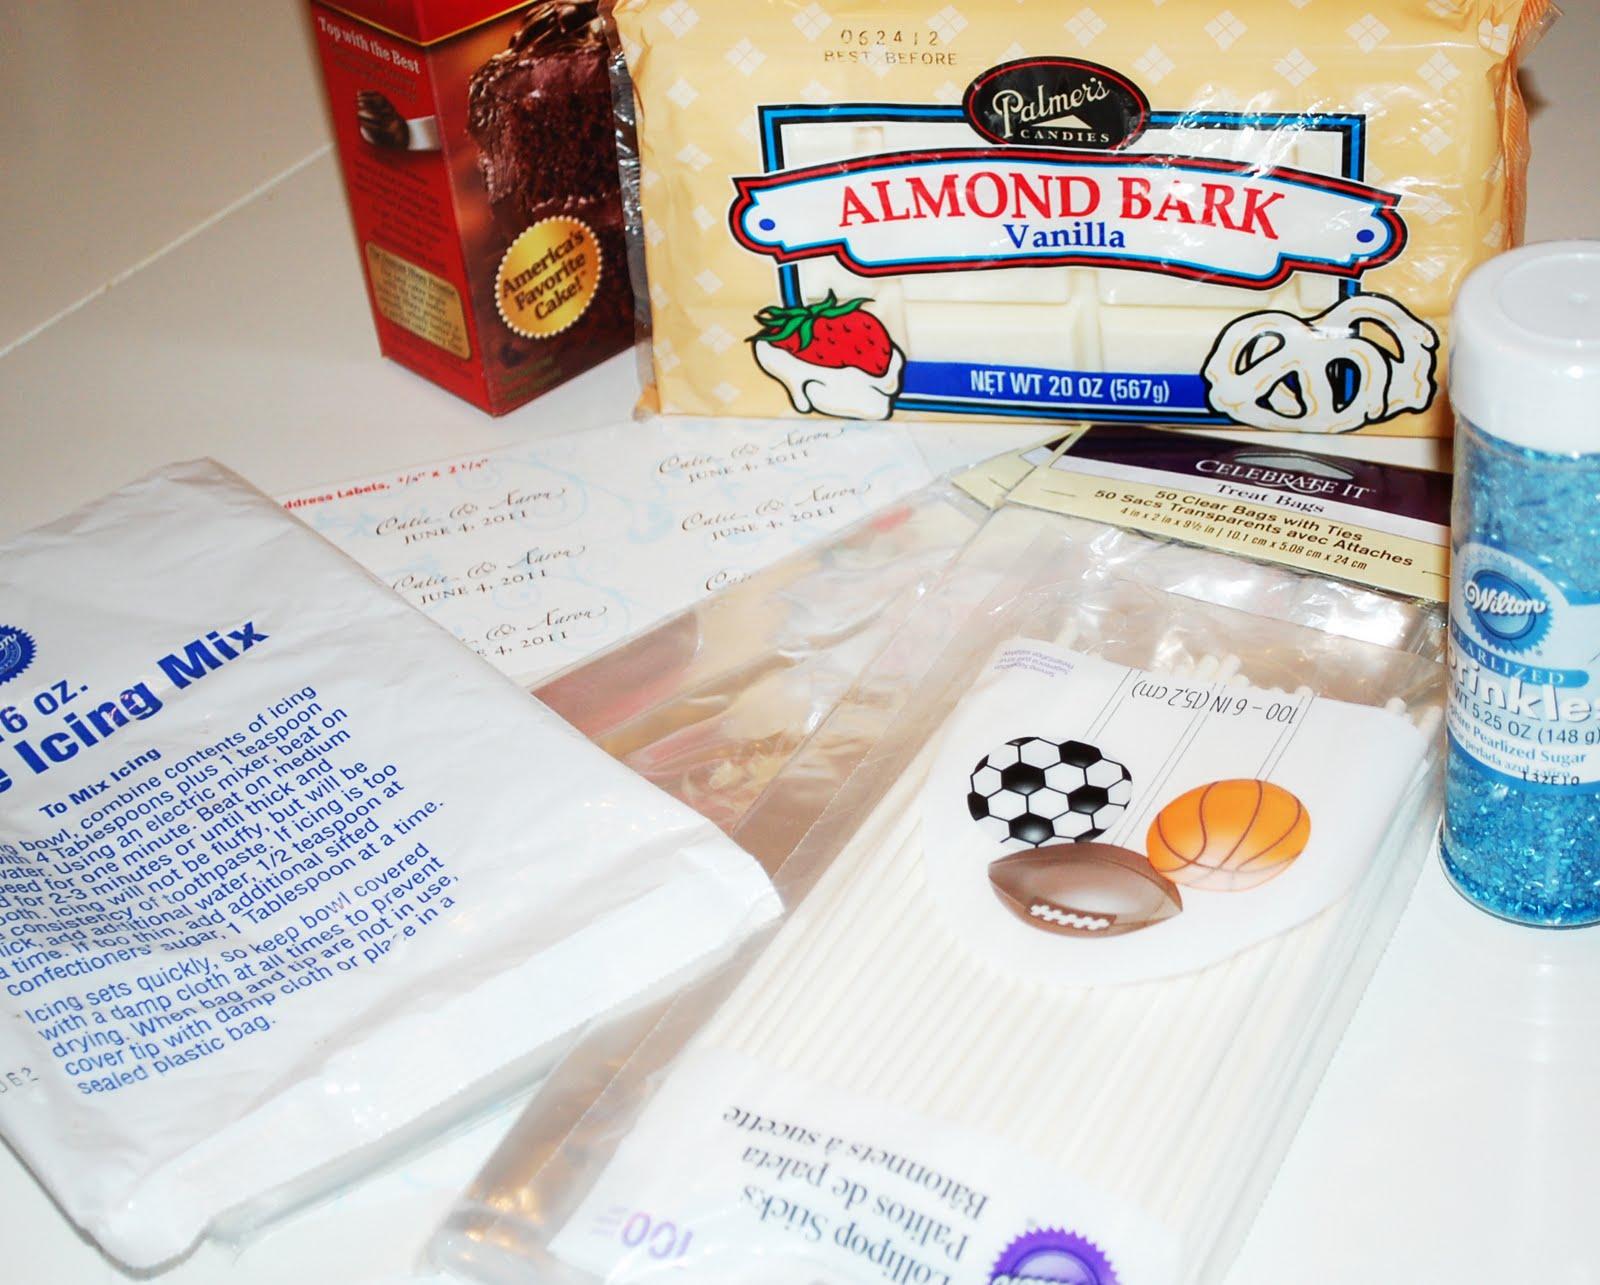 Box Of Cake Mix Makes How Many Cake Pops